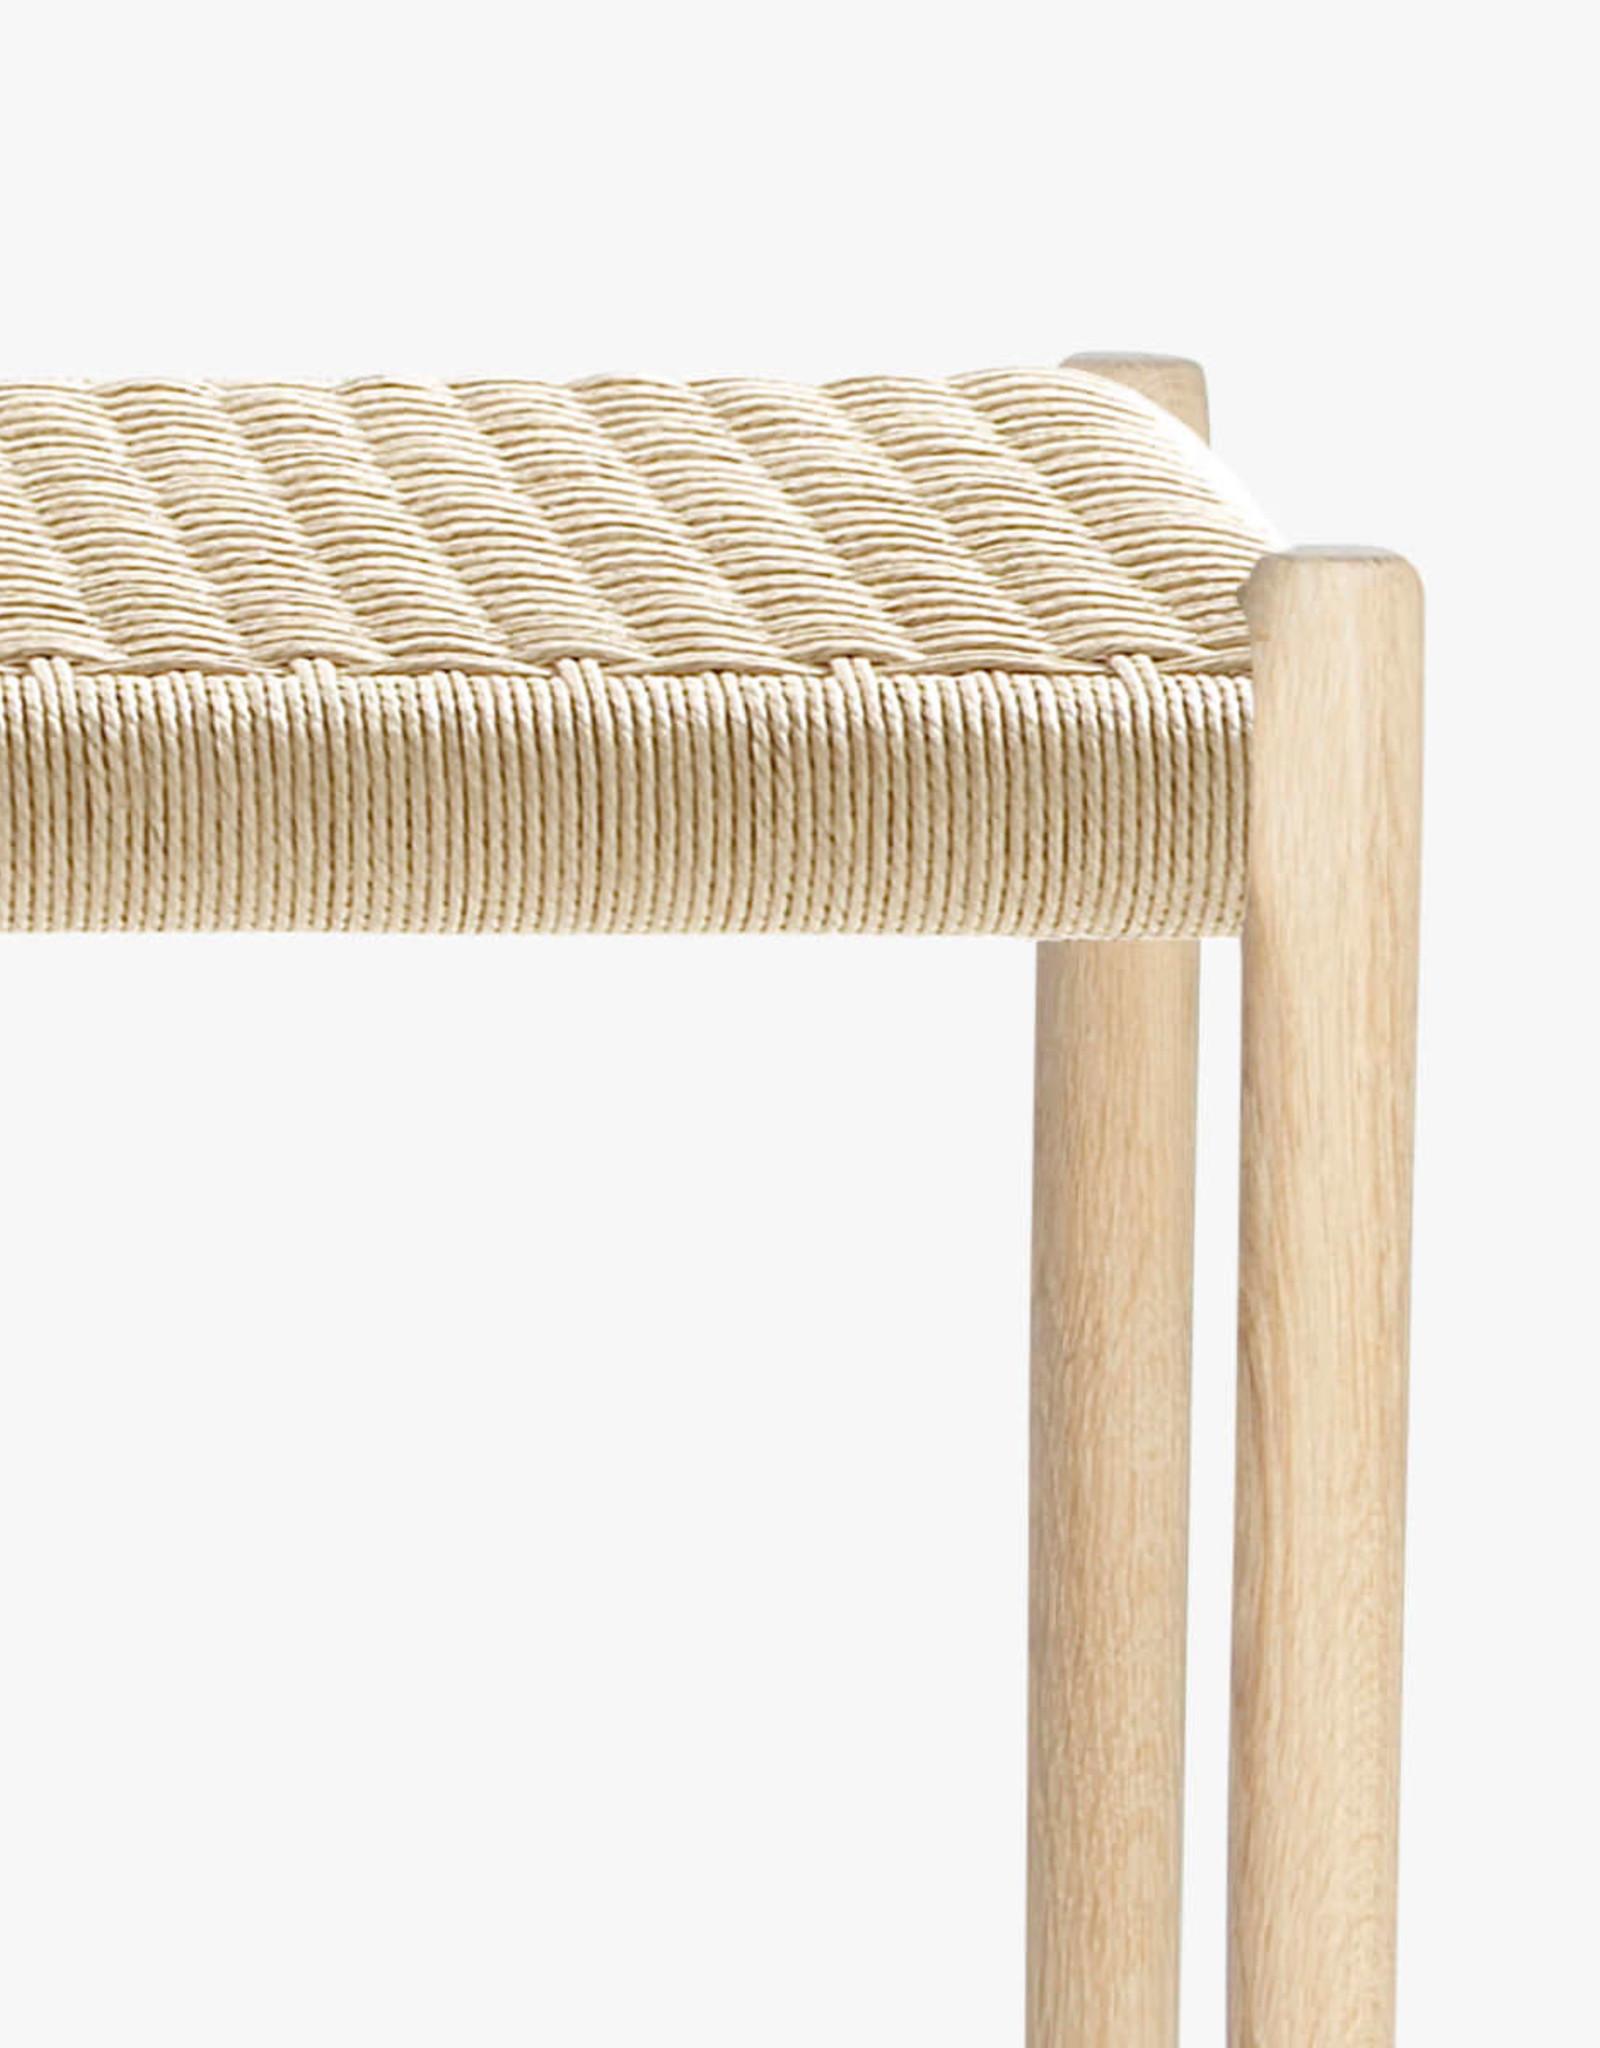 Moller 63 bench by N.O. Moller | Natural cord | Soaped oak frame | L1500cm